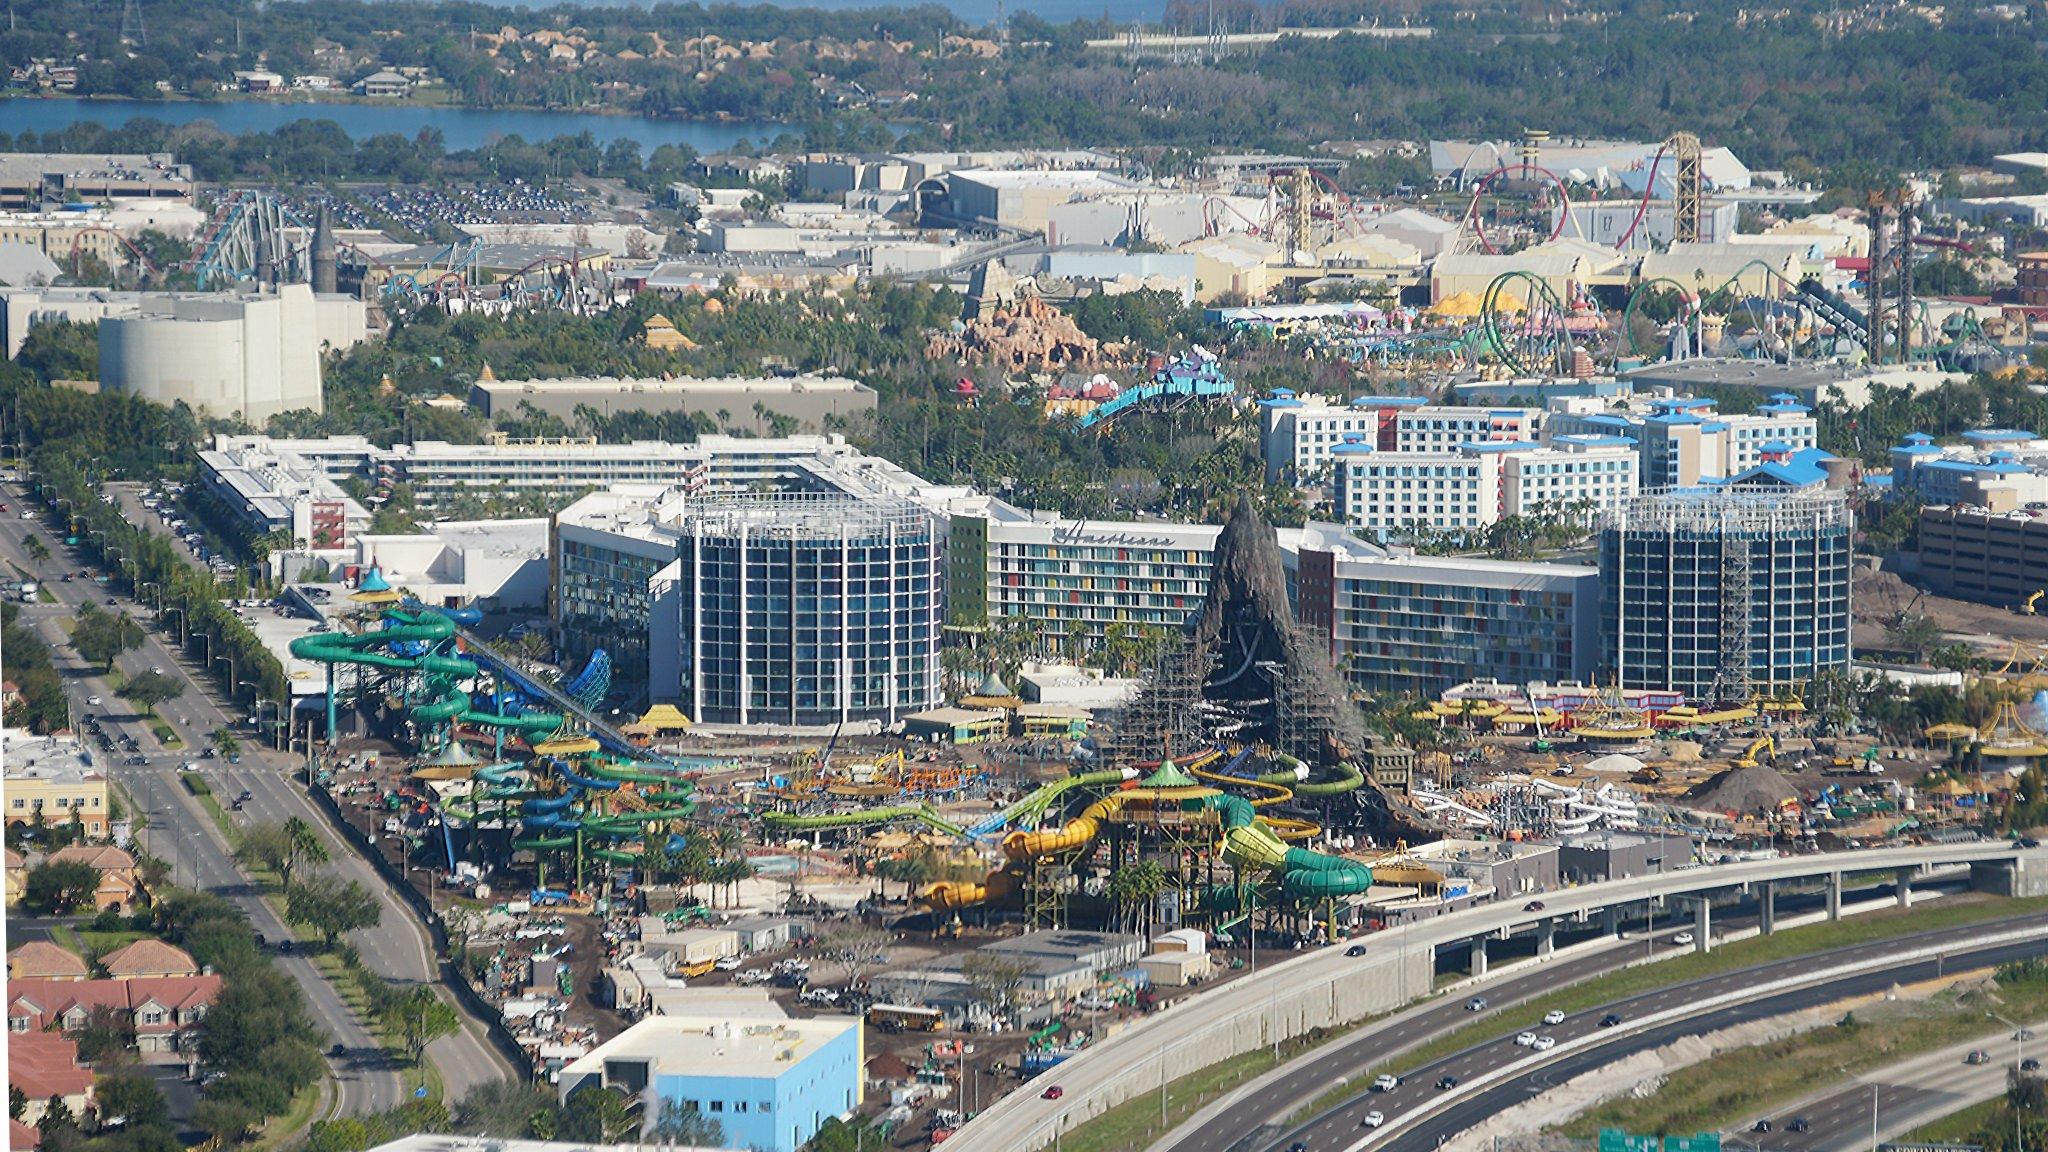 The skyline of Universal Orlando Resort https://t.co/byP4Owmr6o